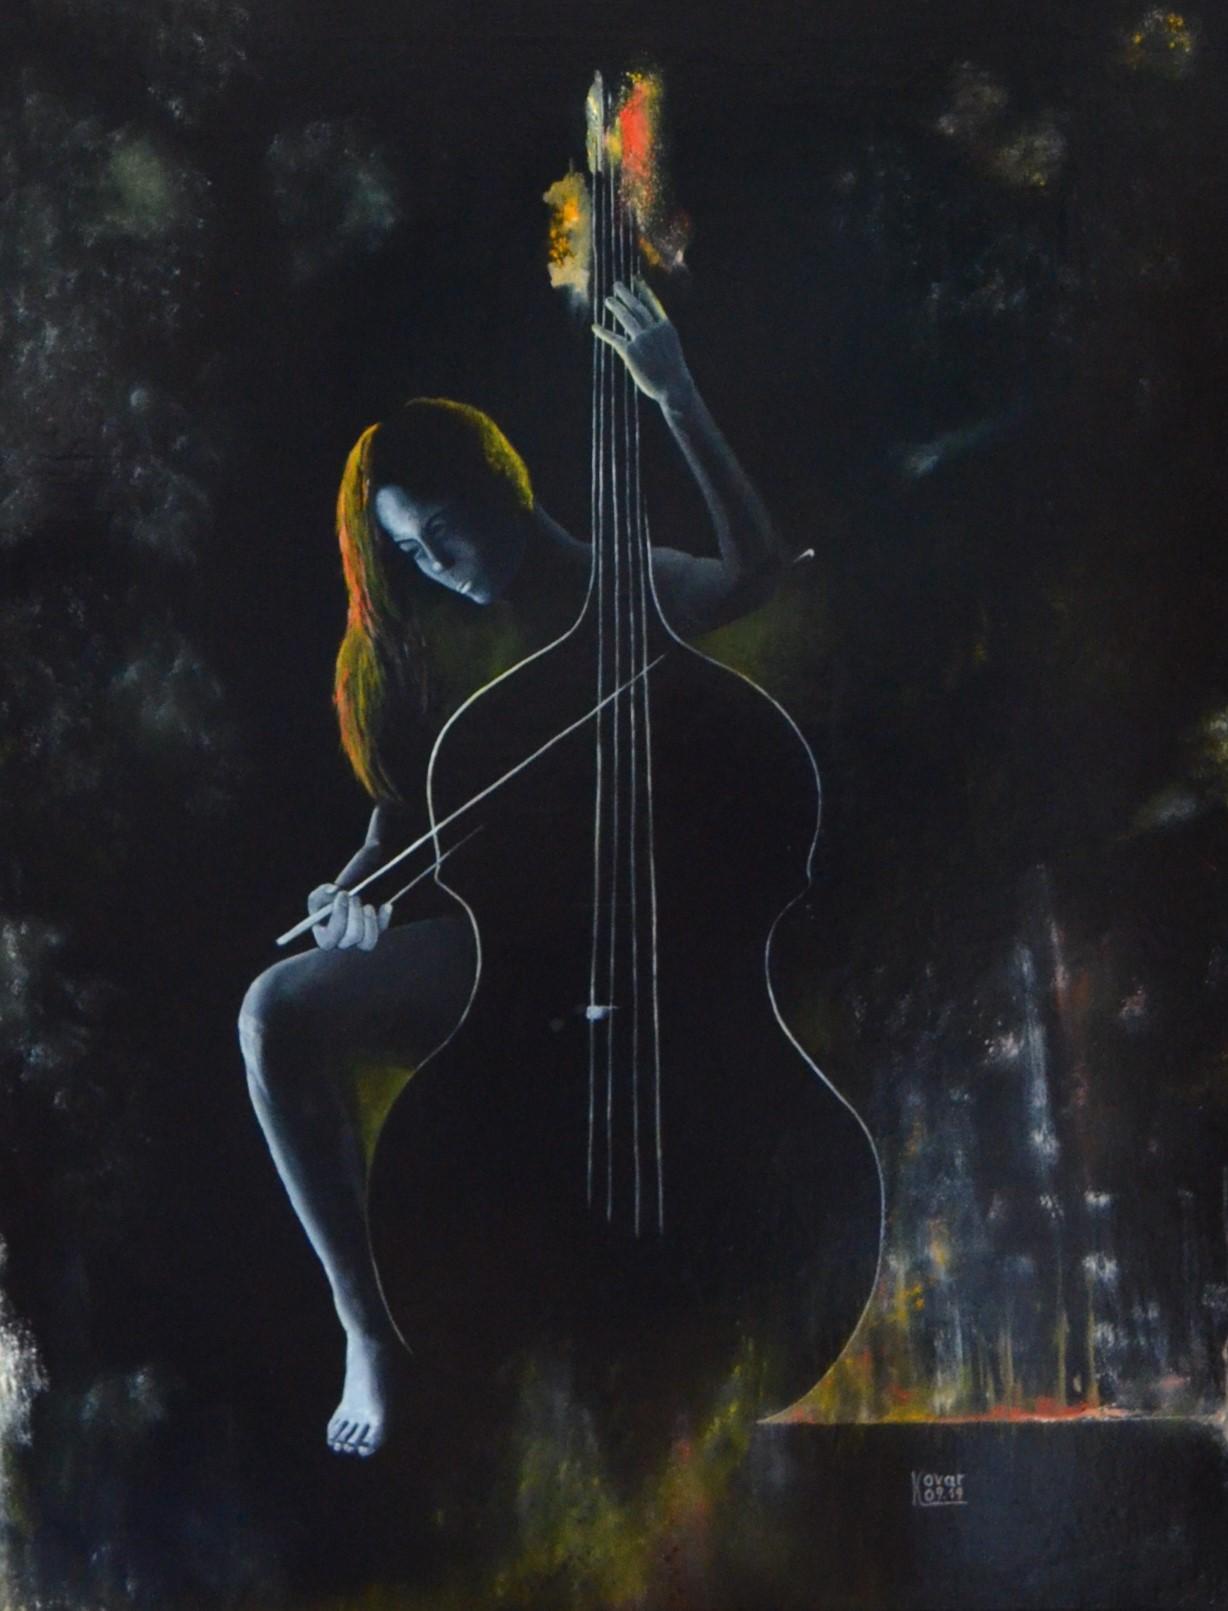 Bassinstrument, Öl  auf Leinwand, 70 x 90 cm, 2019, Oil on canvas.